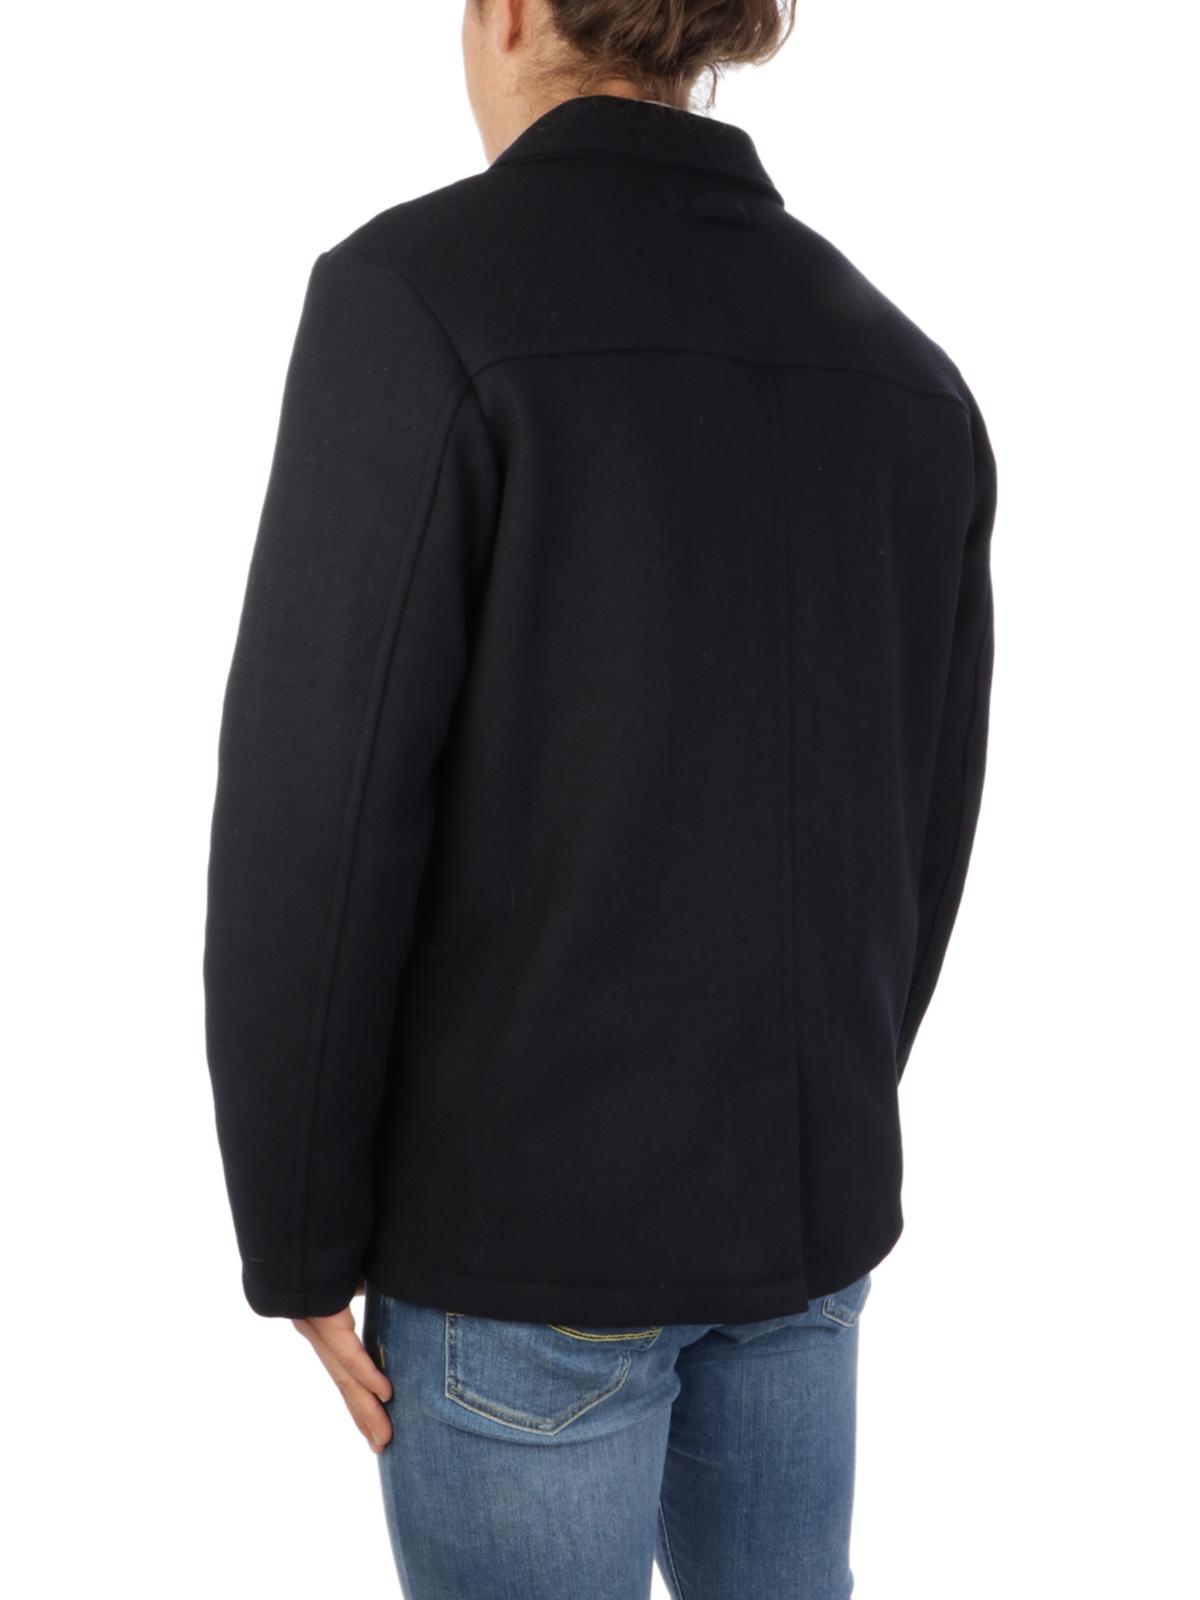 Picture of BROOKSFIELD | Men's Wool Work Jacket